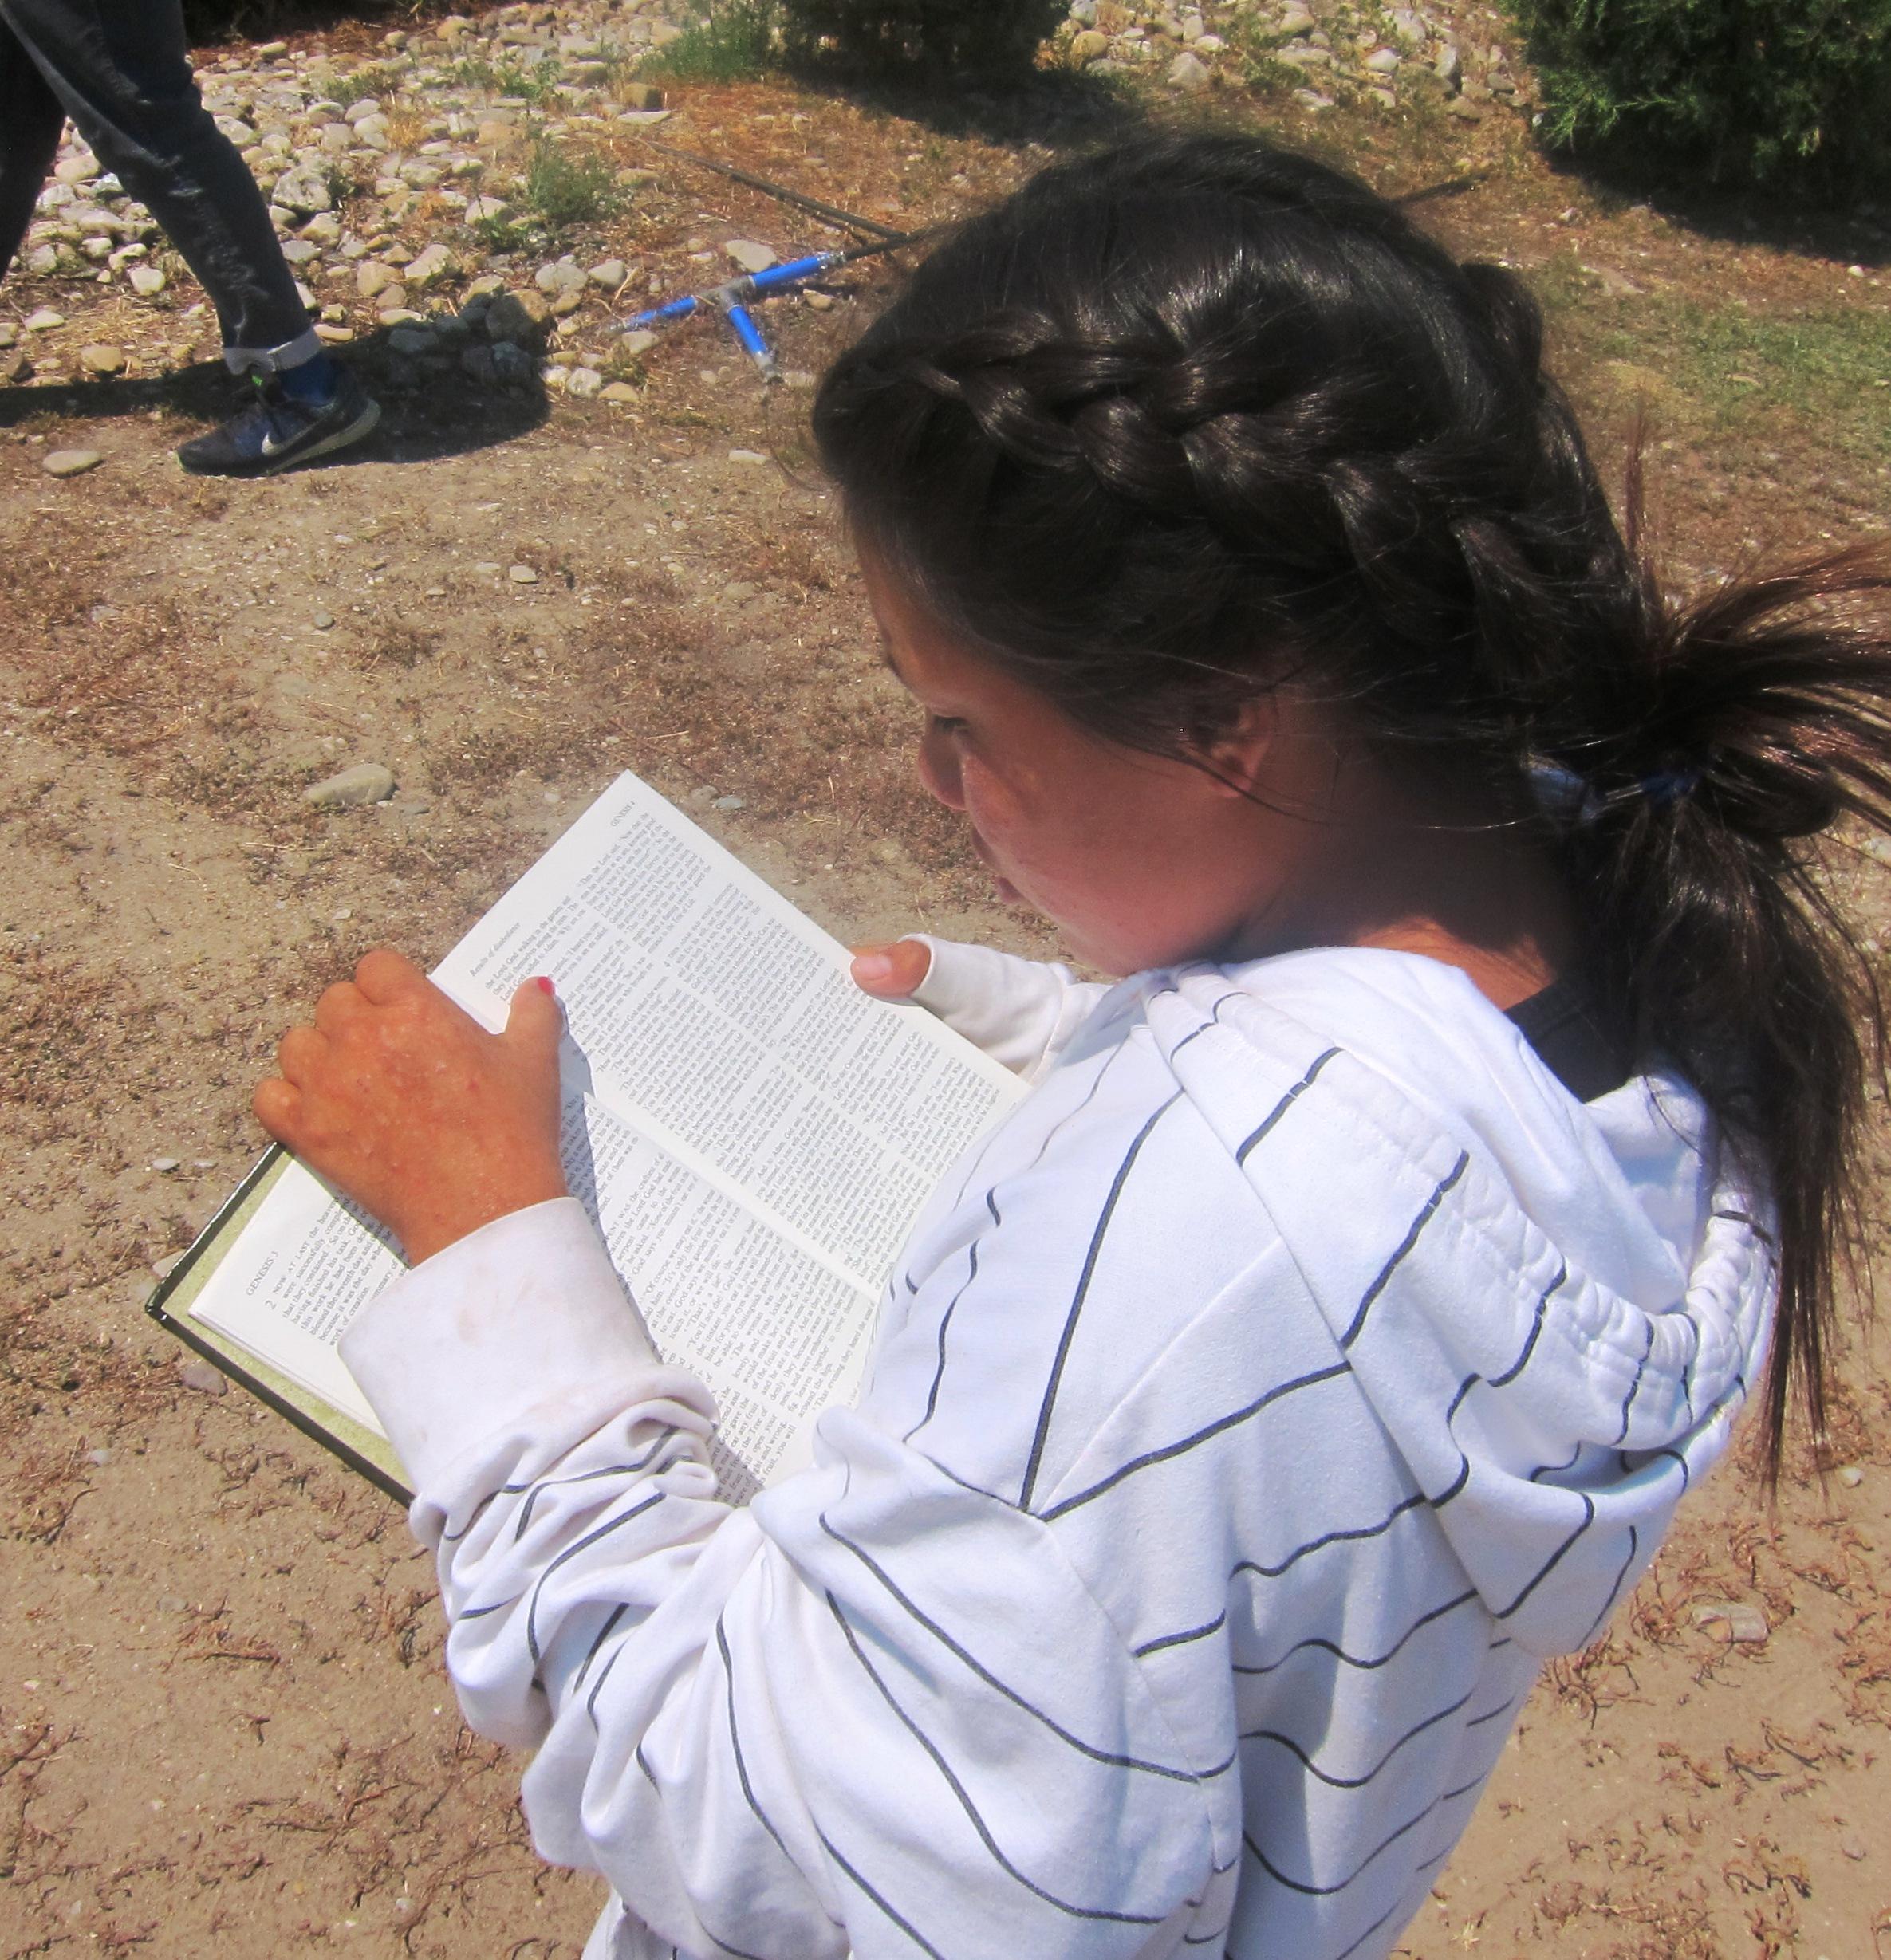 Carteecia reading bible.jpg